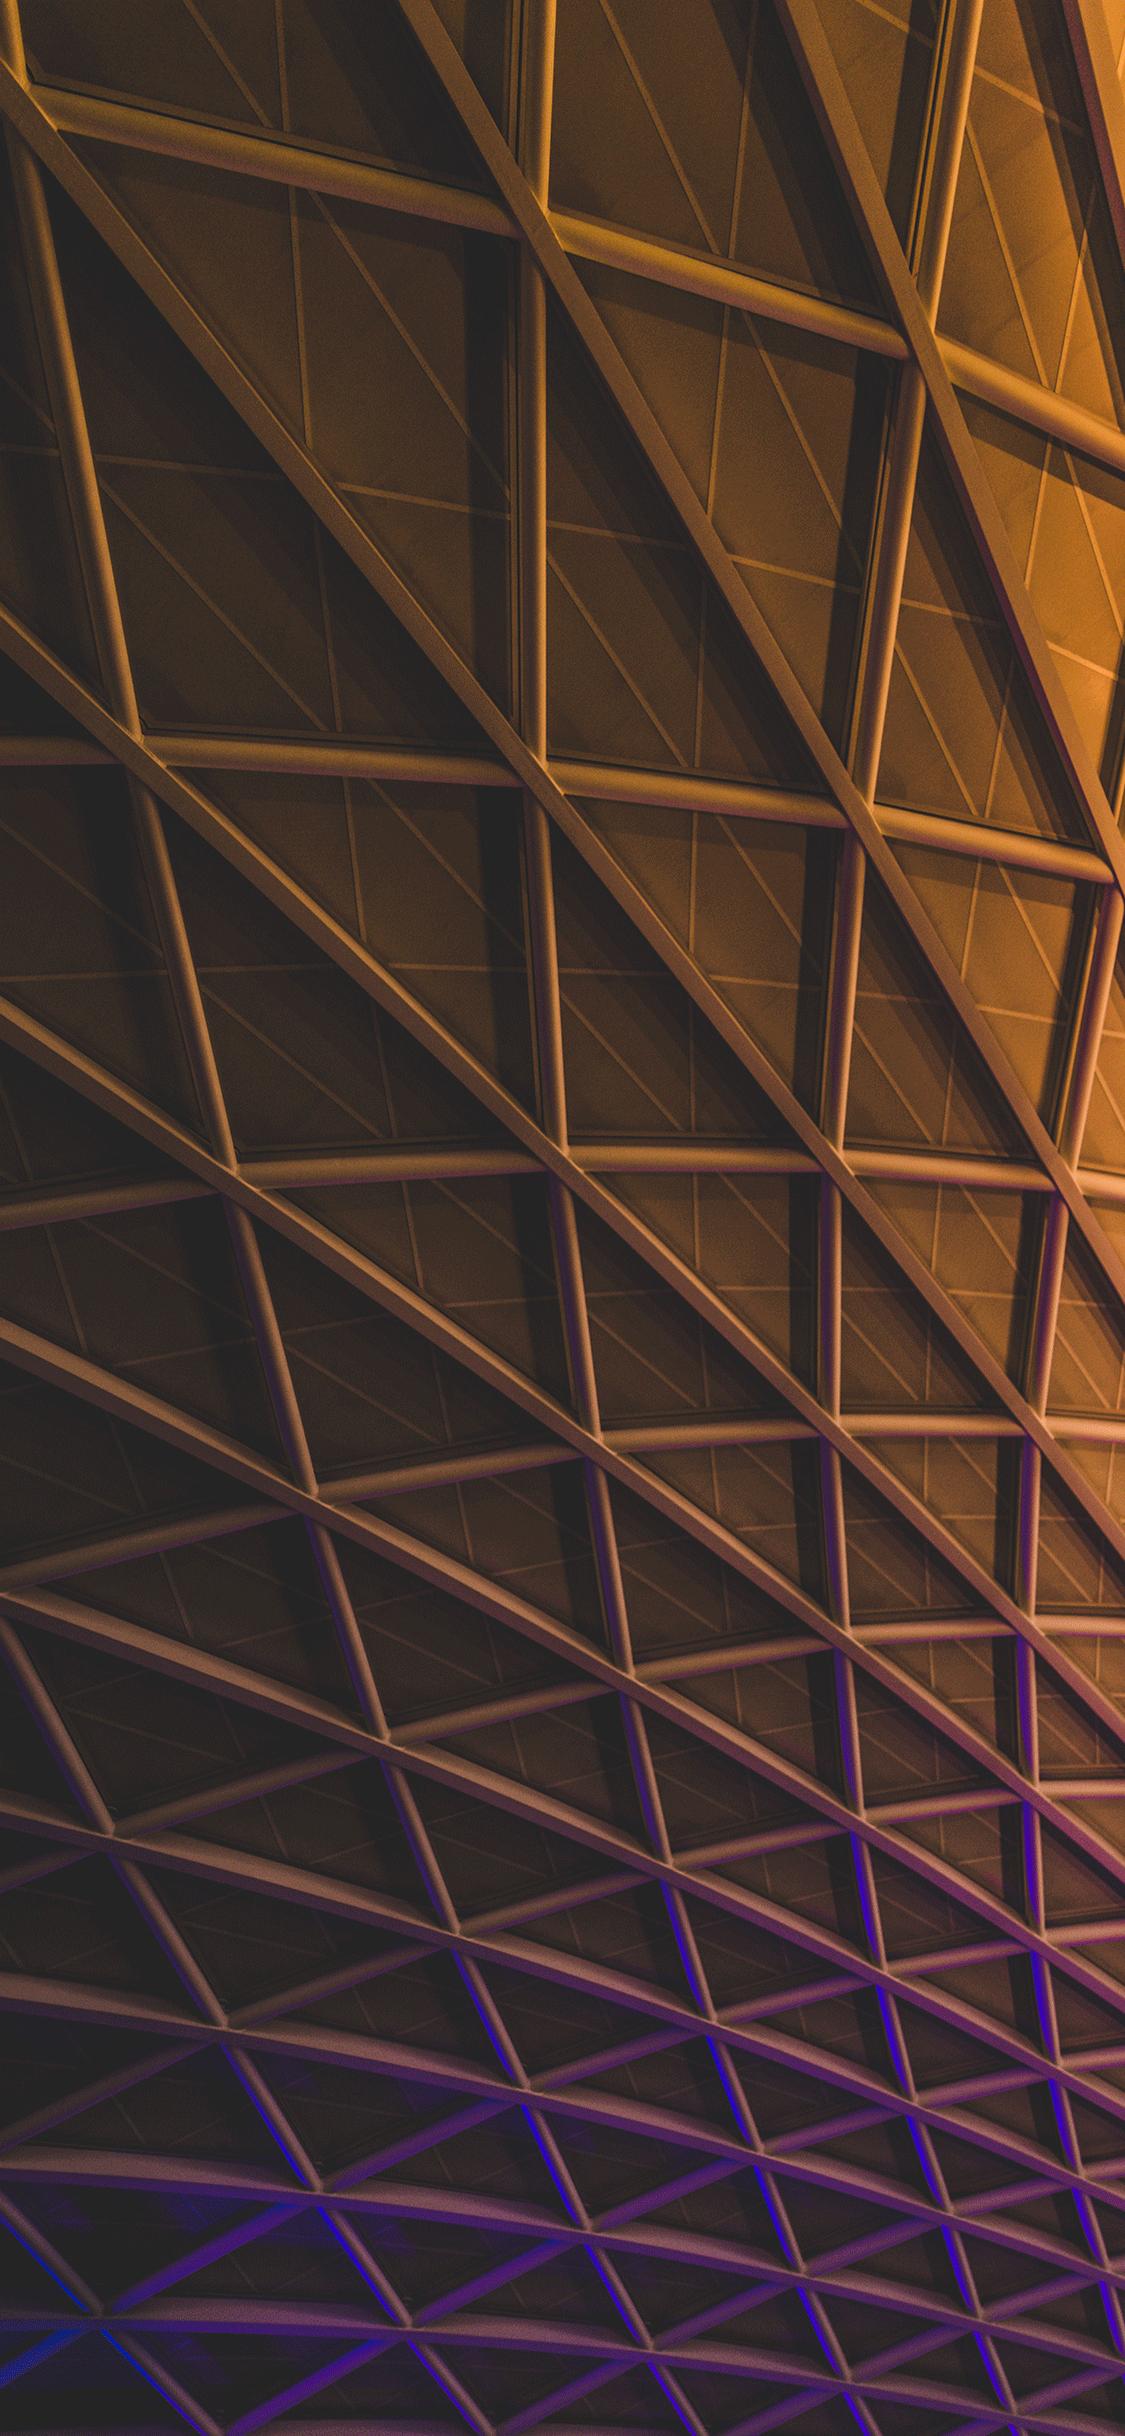 iPhone wallpaper architecture london Architecture